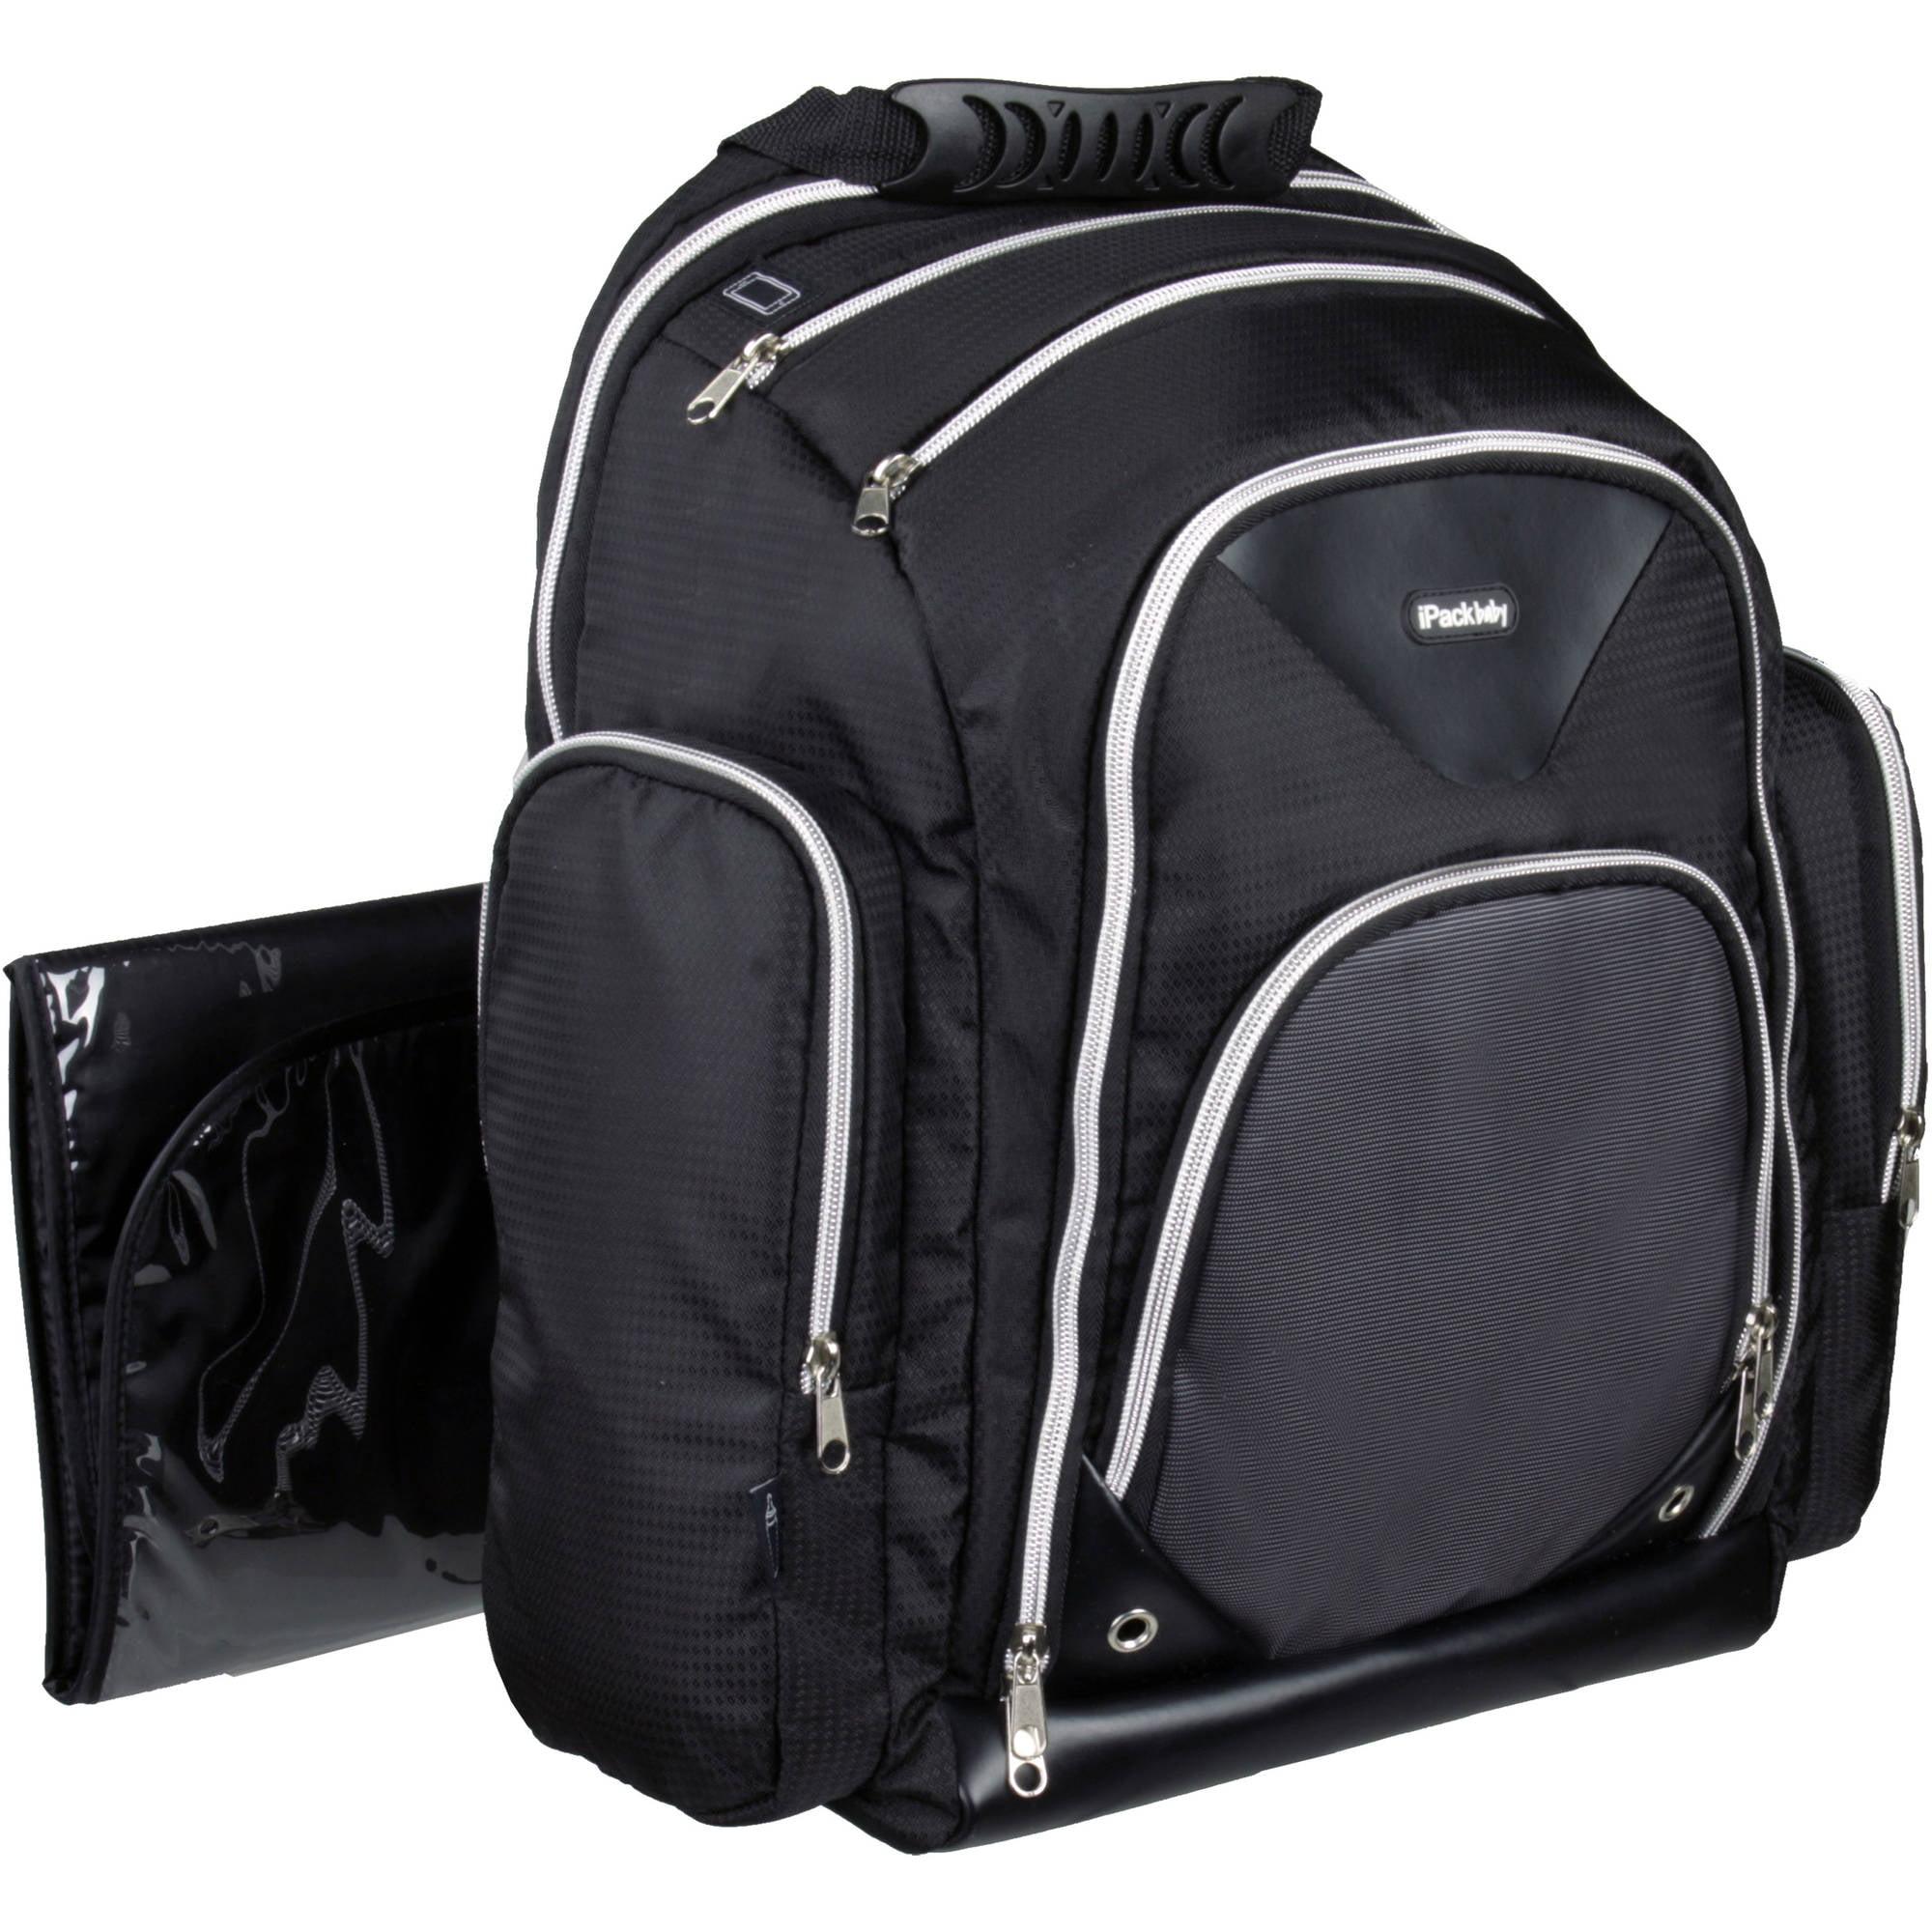 Urbini Turni Travel System With Ipack Baby Diaper Bag Backpack Value Bundle Walmart Com